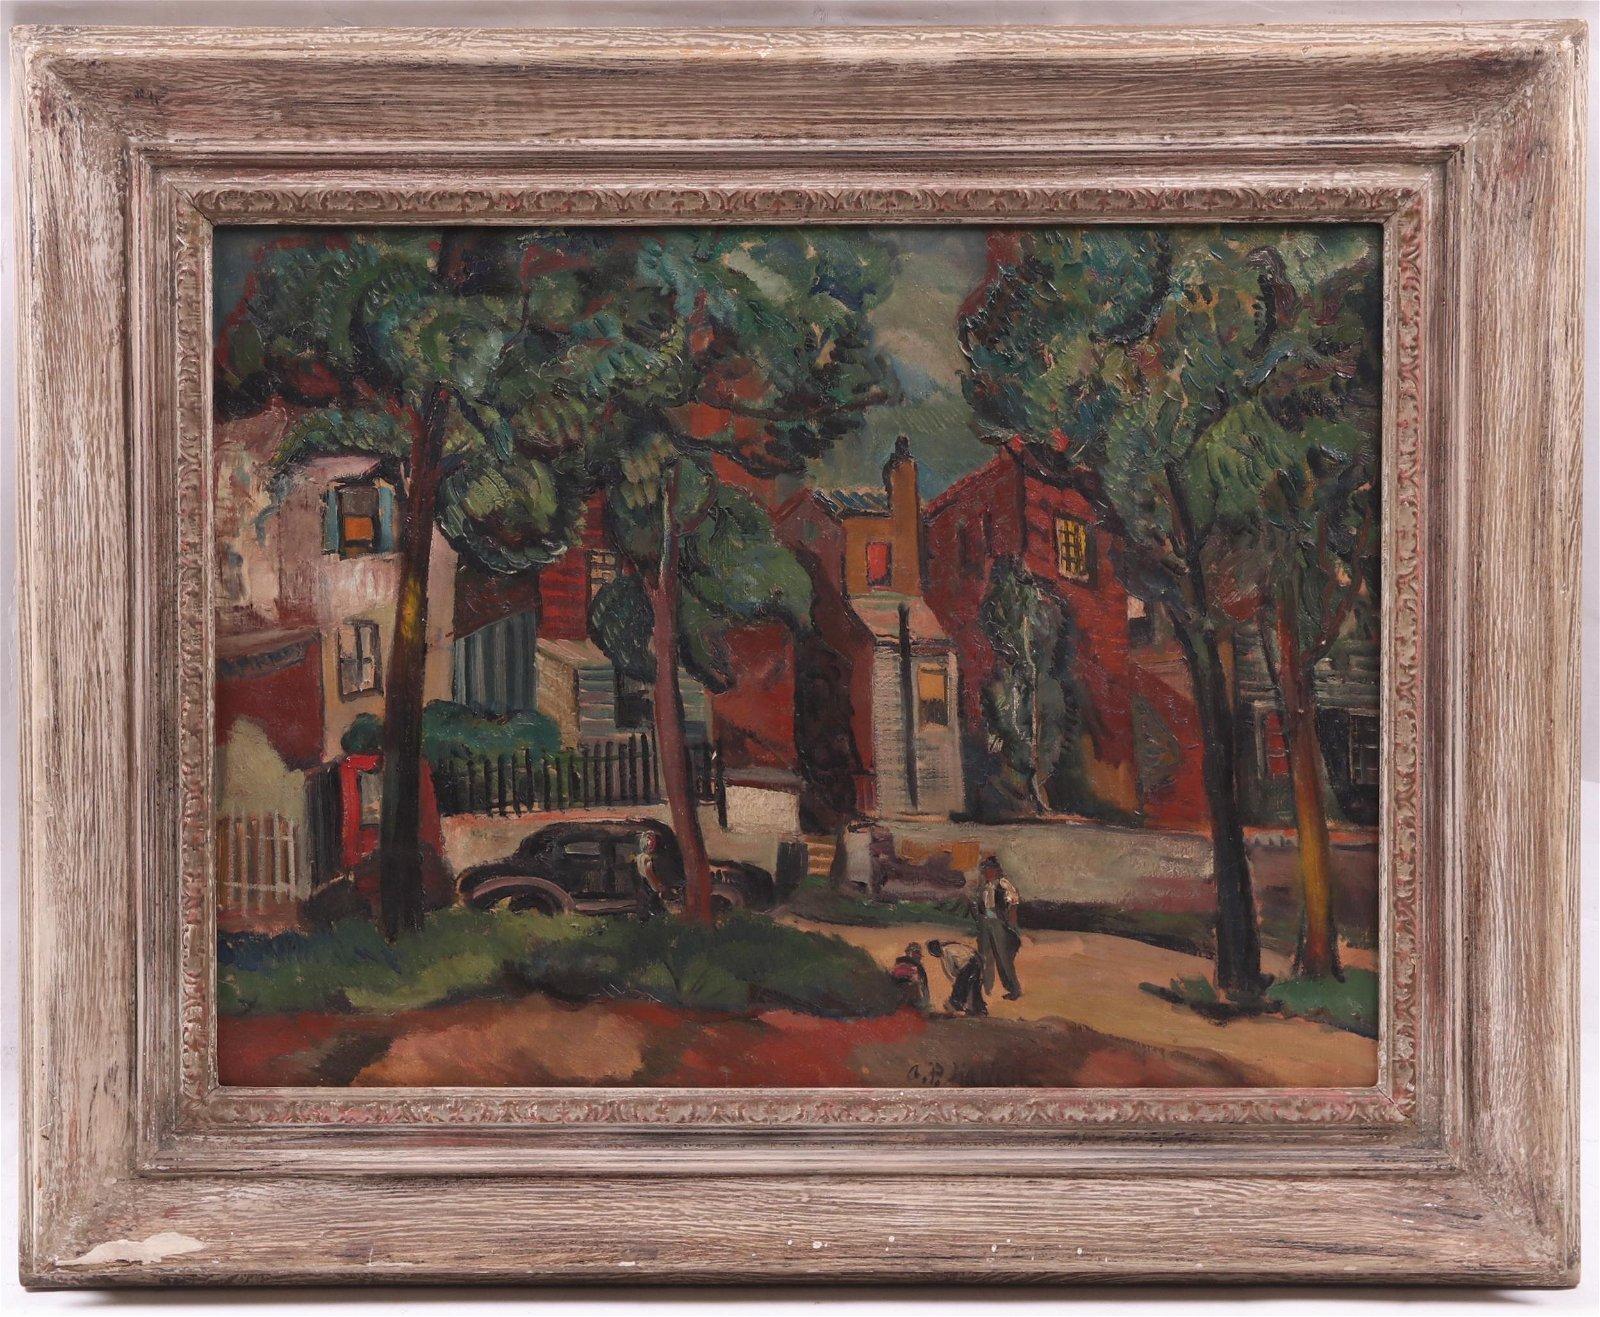 Abraham Hankins (American 1904-1963) Oil on Canvas